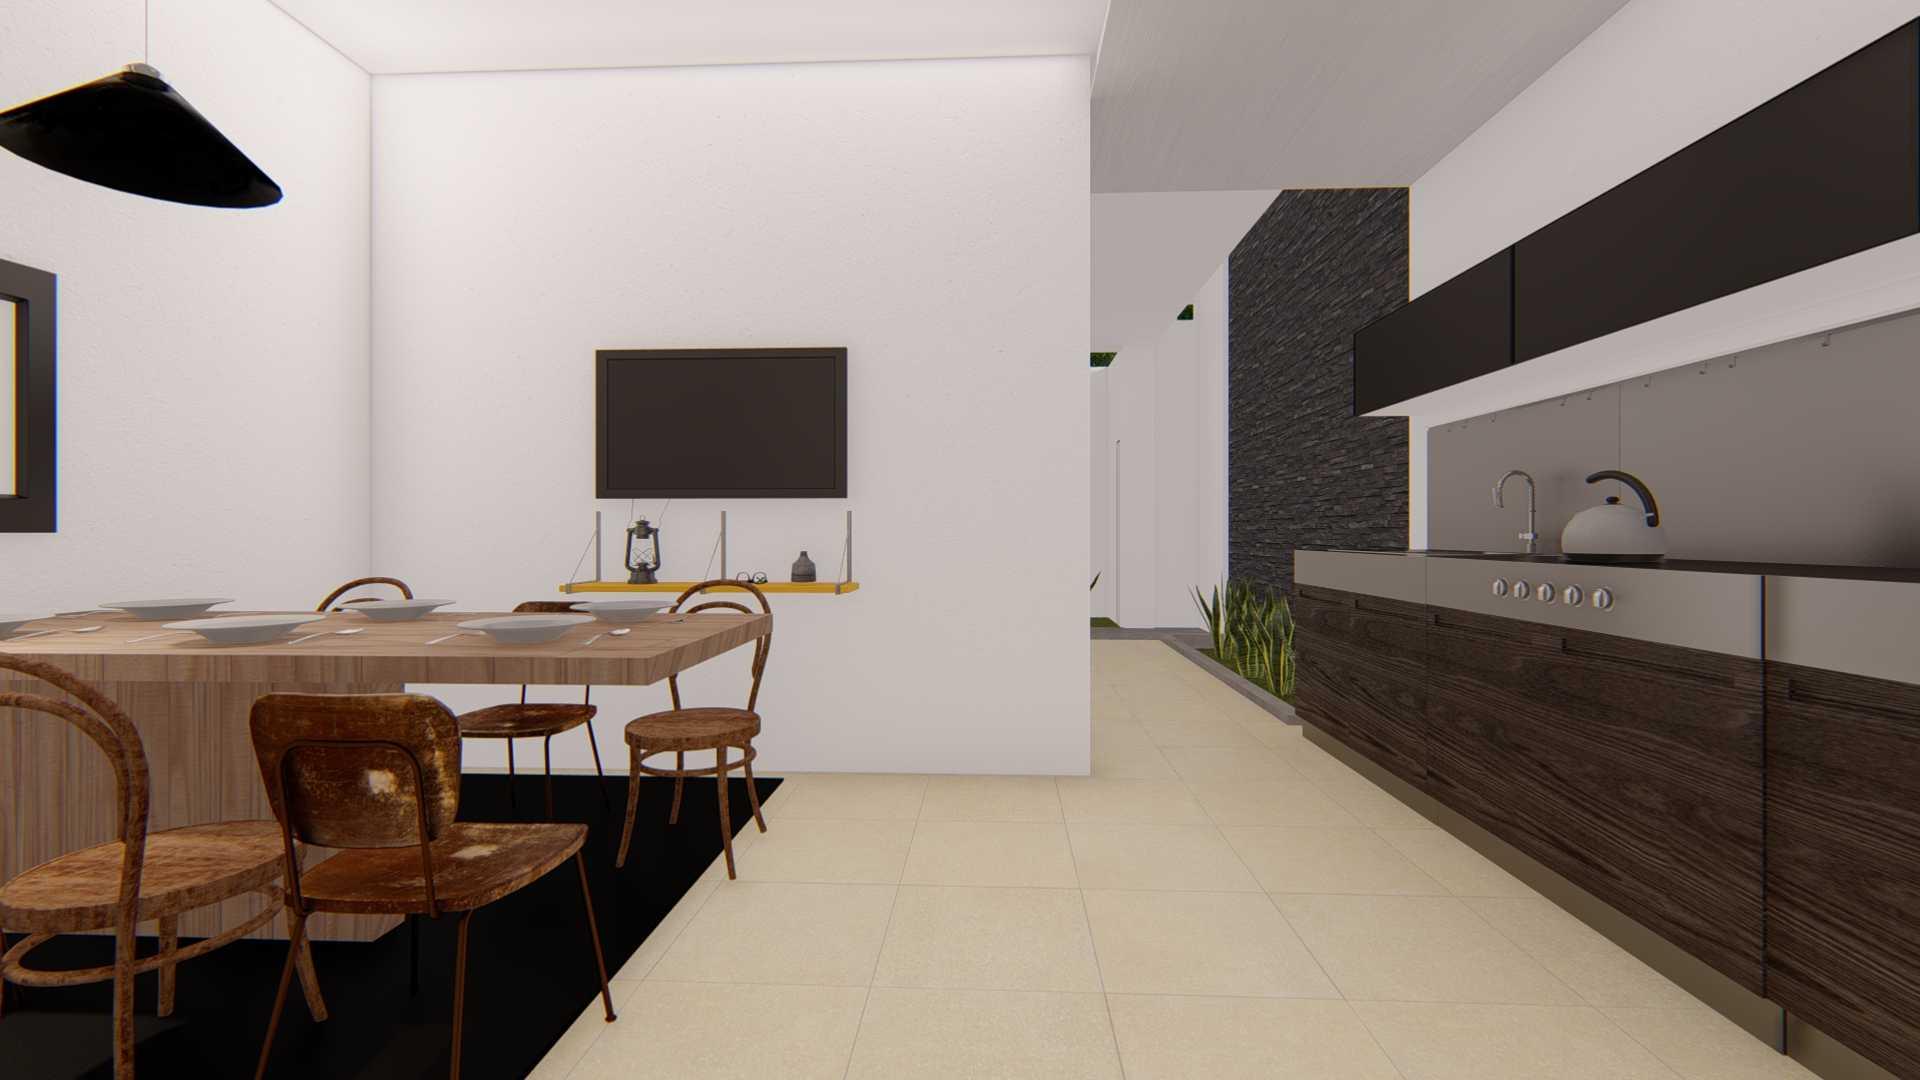 Suba-Arch Minimalist Modern Style House Kota Tgr. Sel., Kota Tangerang Selatan, Banten, Indonesia Kota Tgr. Sel., Kota Tangerang Selatan, Banten, Indonesia Suba-Arch-Minimalist-Modern-Style-House Minimalist 81022